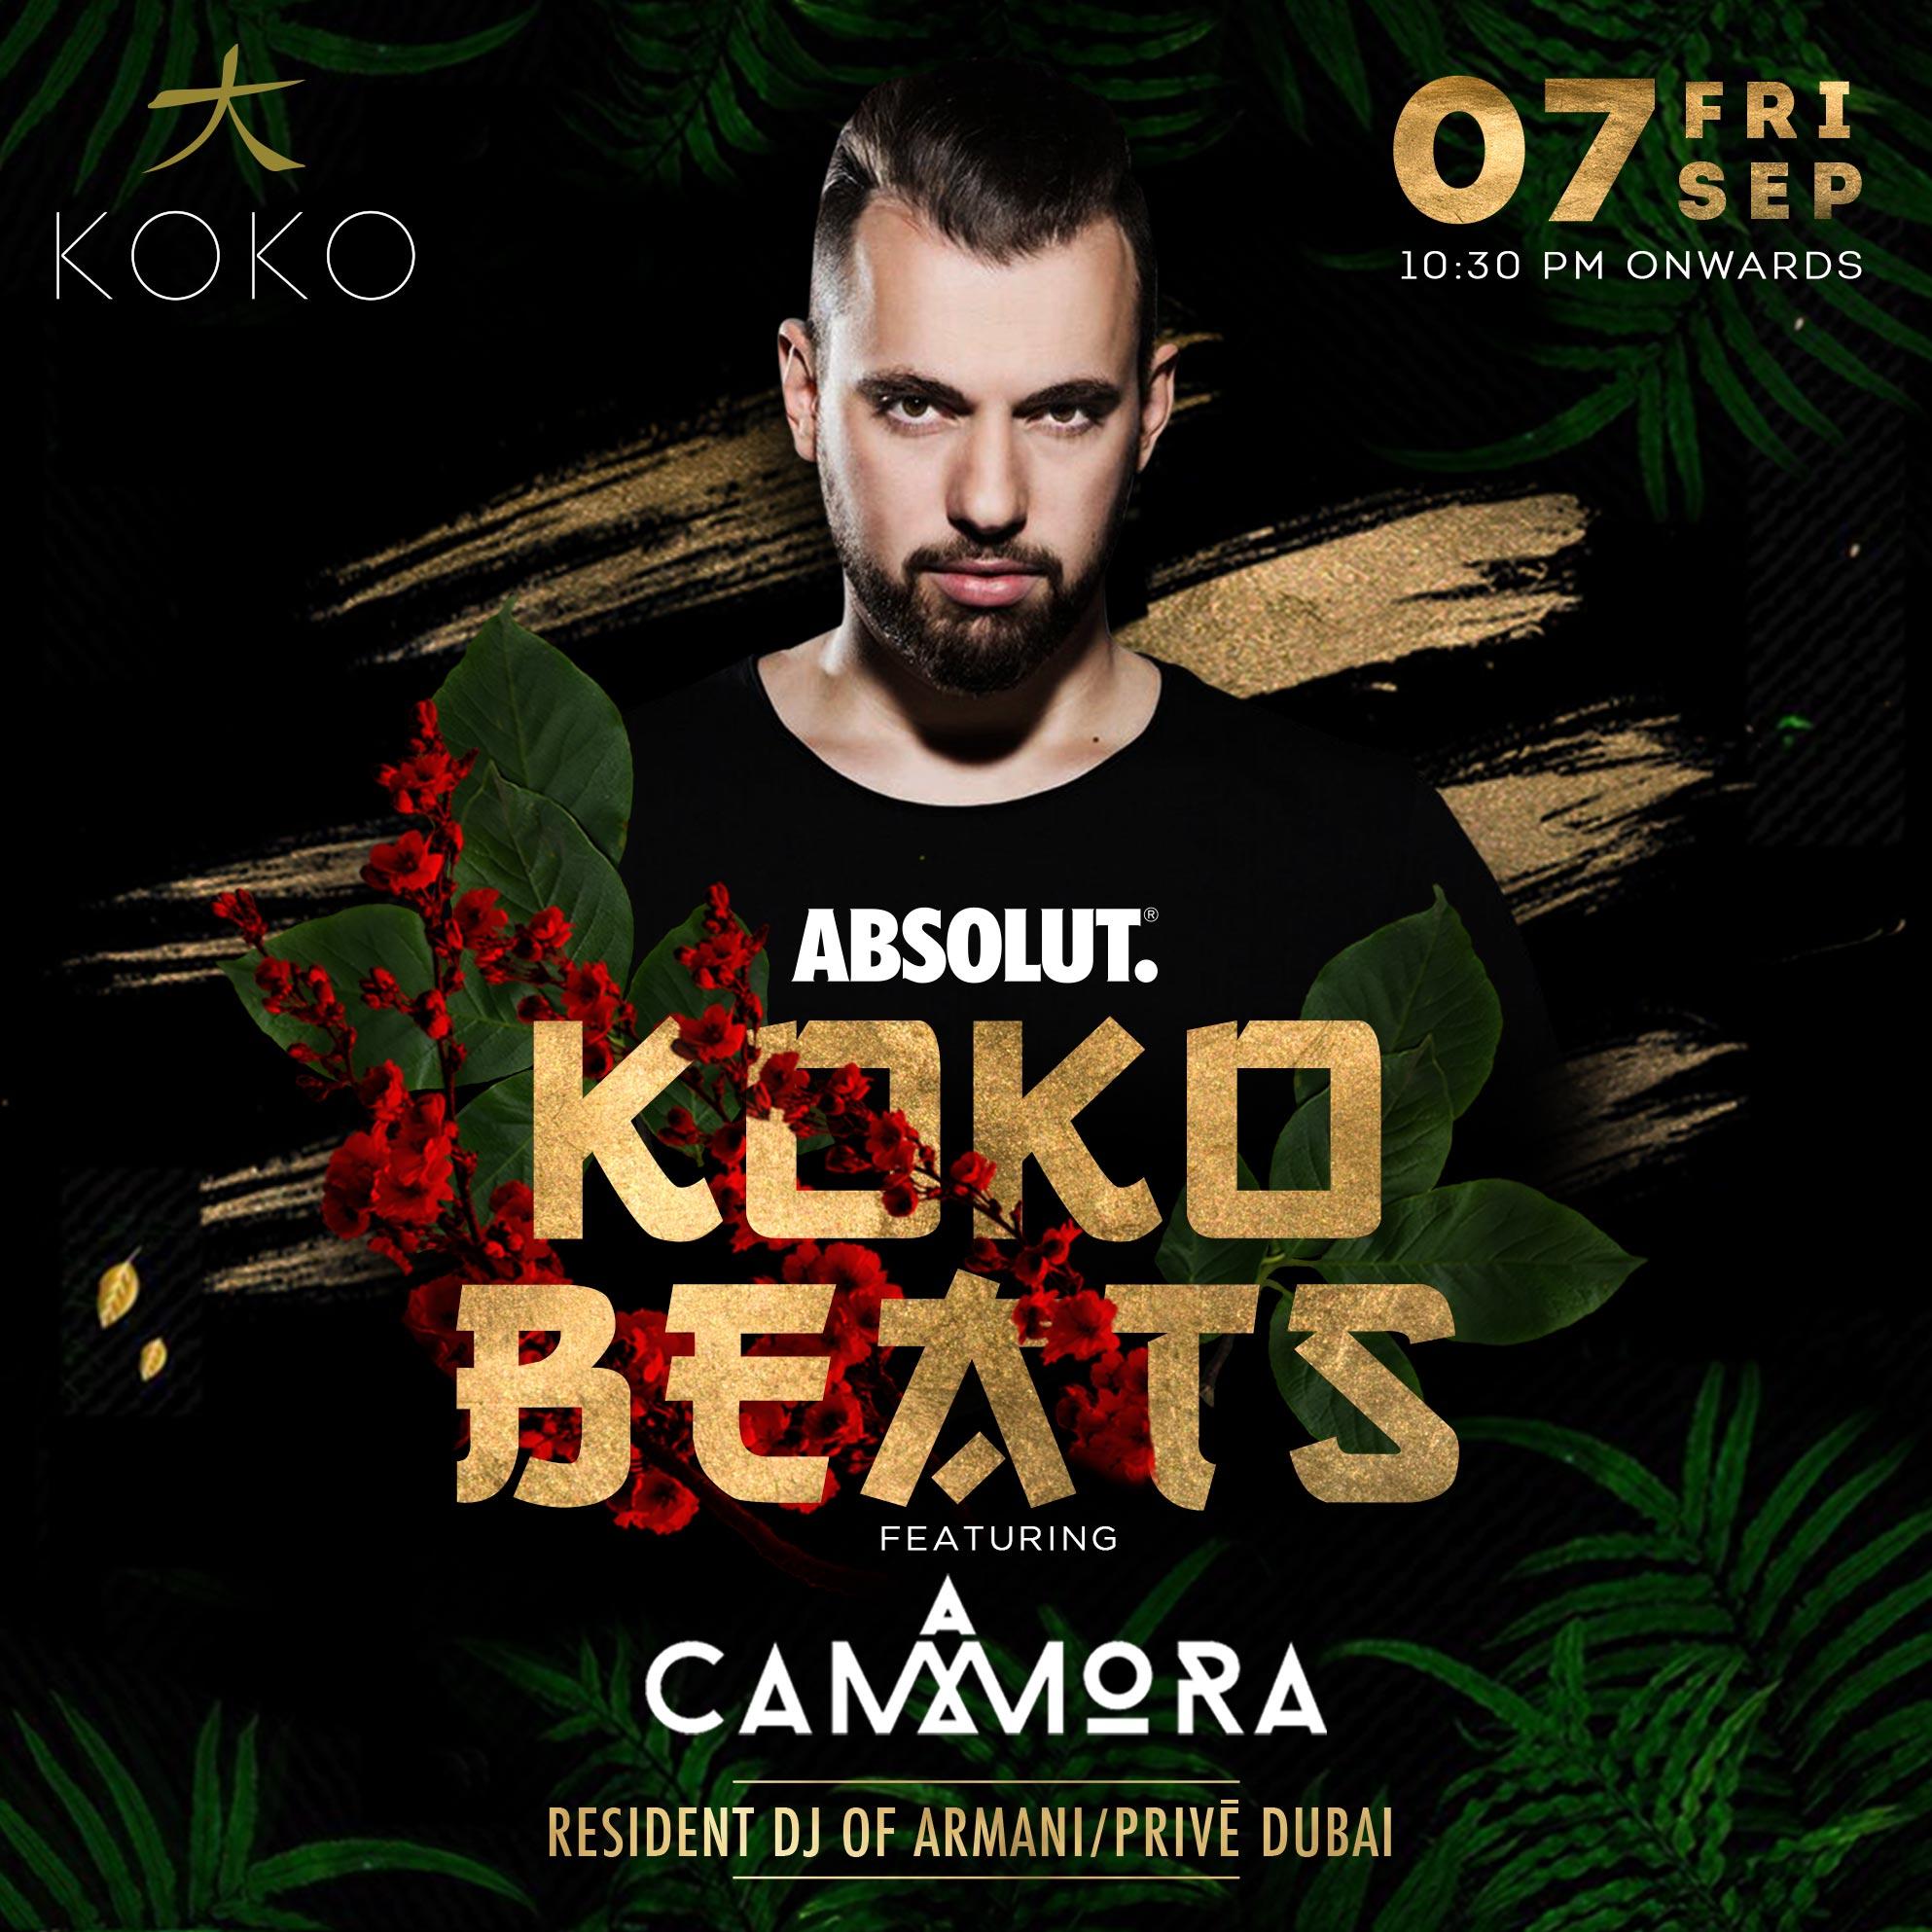 Koko-Beats-Event.jpg